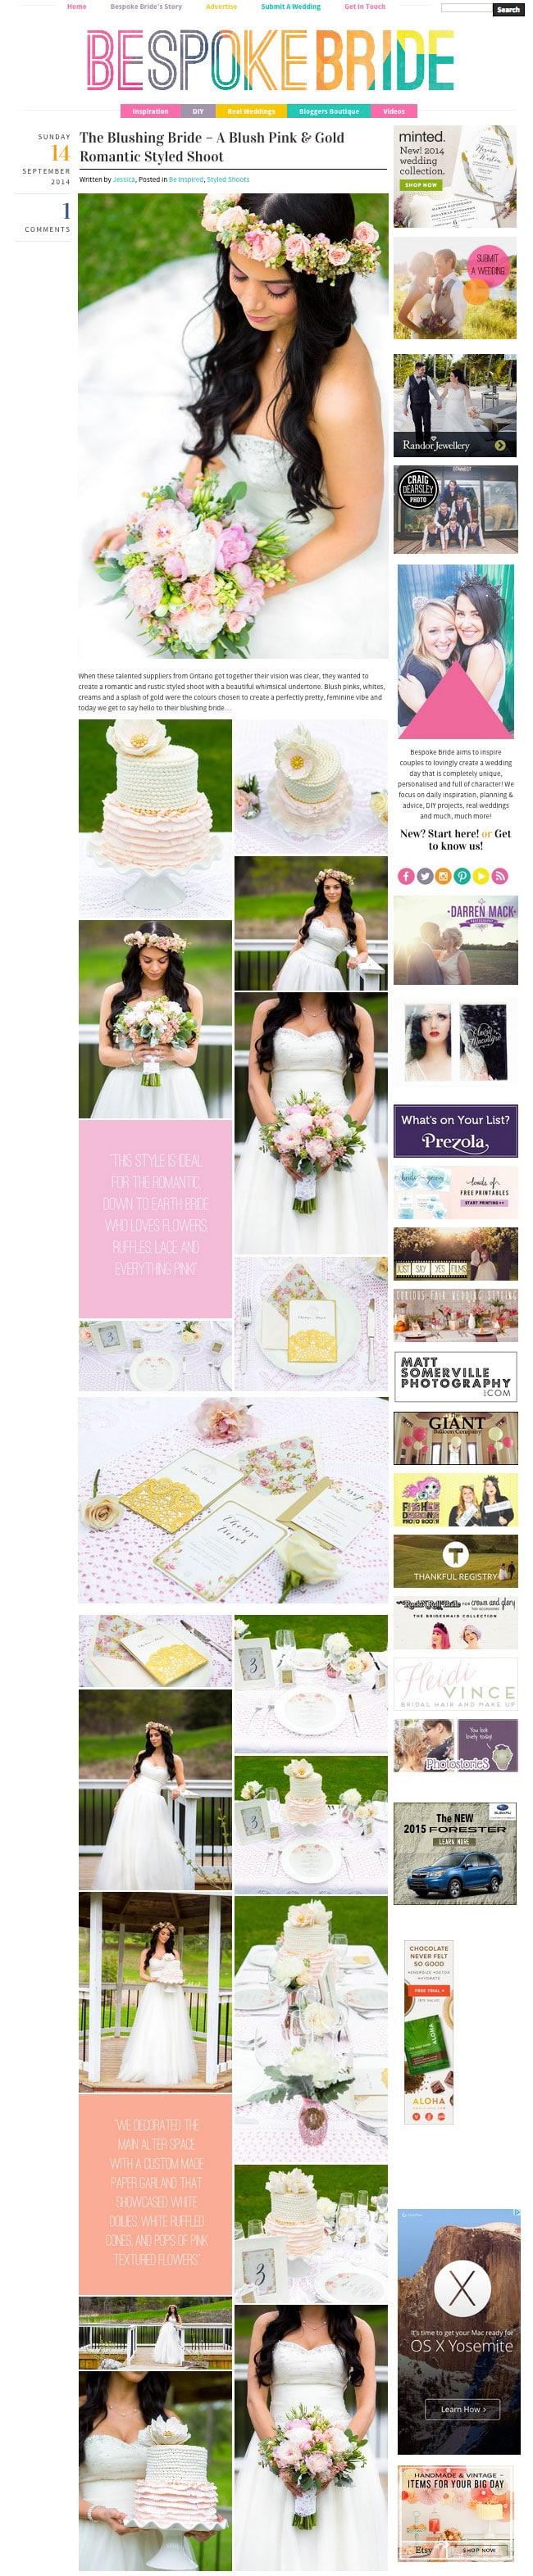 Bespoke Bride Wedding Photos